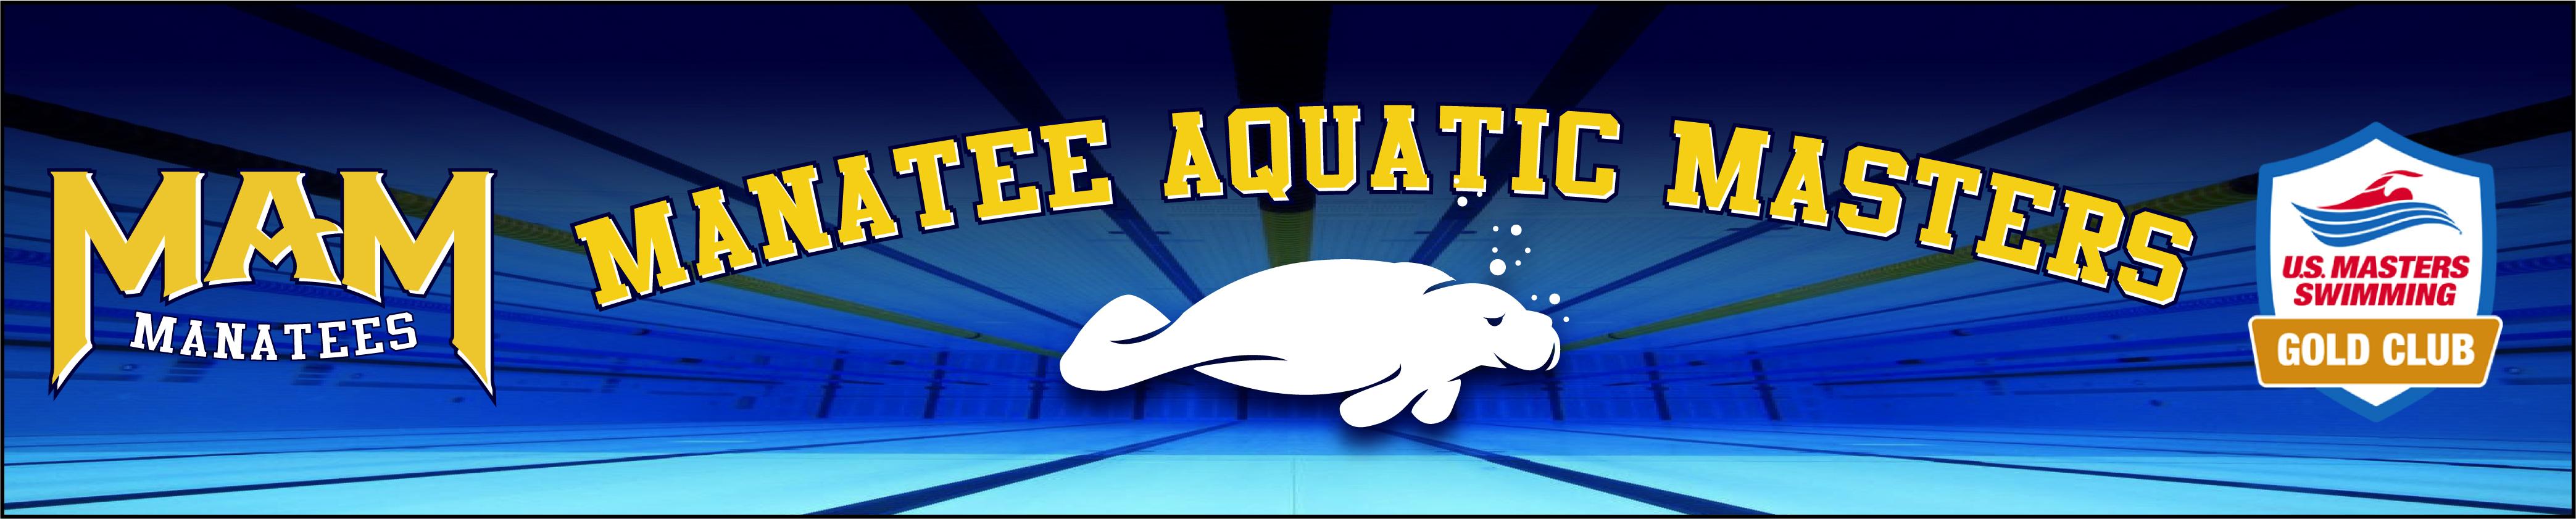 Manatee Aquatic Masters